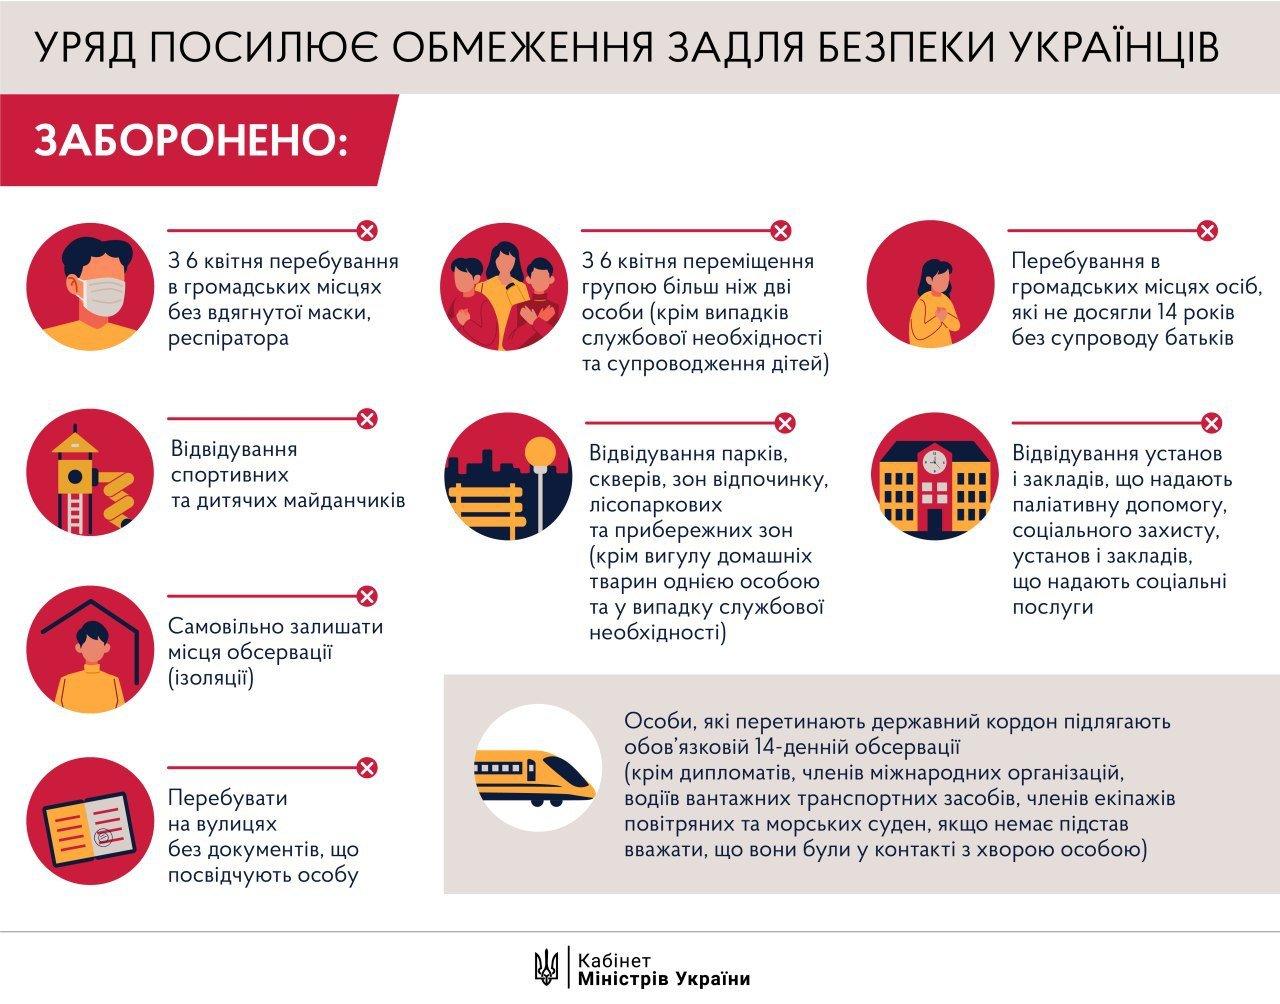 Николаевская епархия УПЦ напомнила об усилении в Украине мер карантина в связи с  COVID-19., фото-1